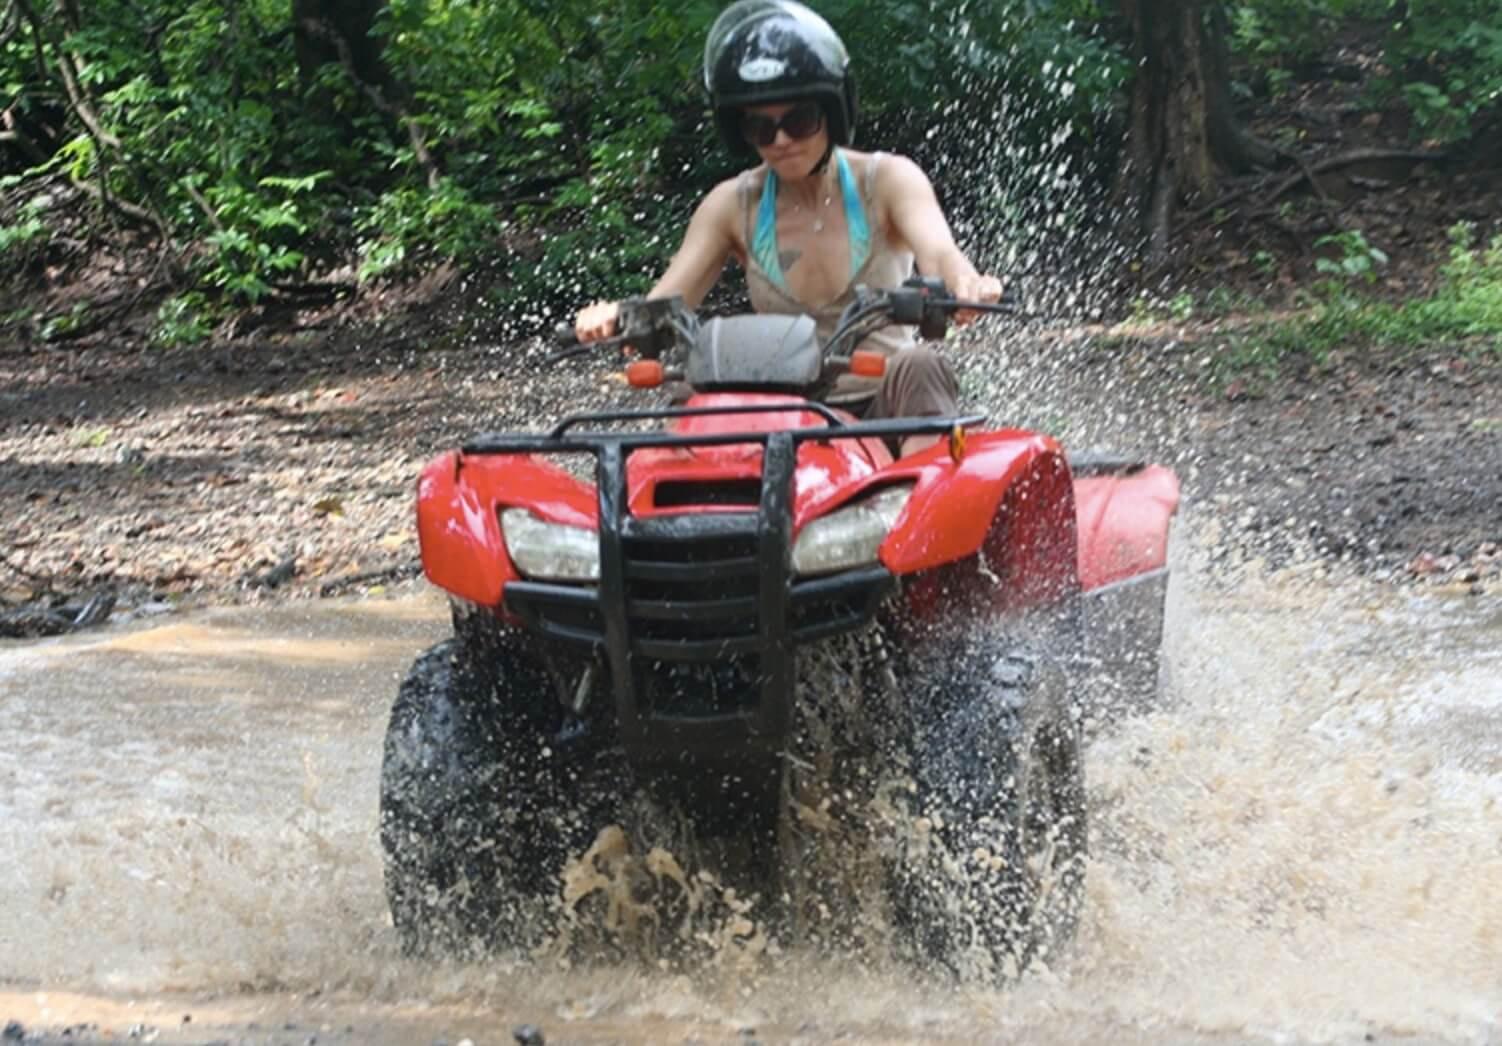 Tamarindo Guanacaste ATV adventure tour guest crossing a river